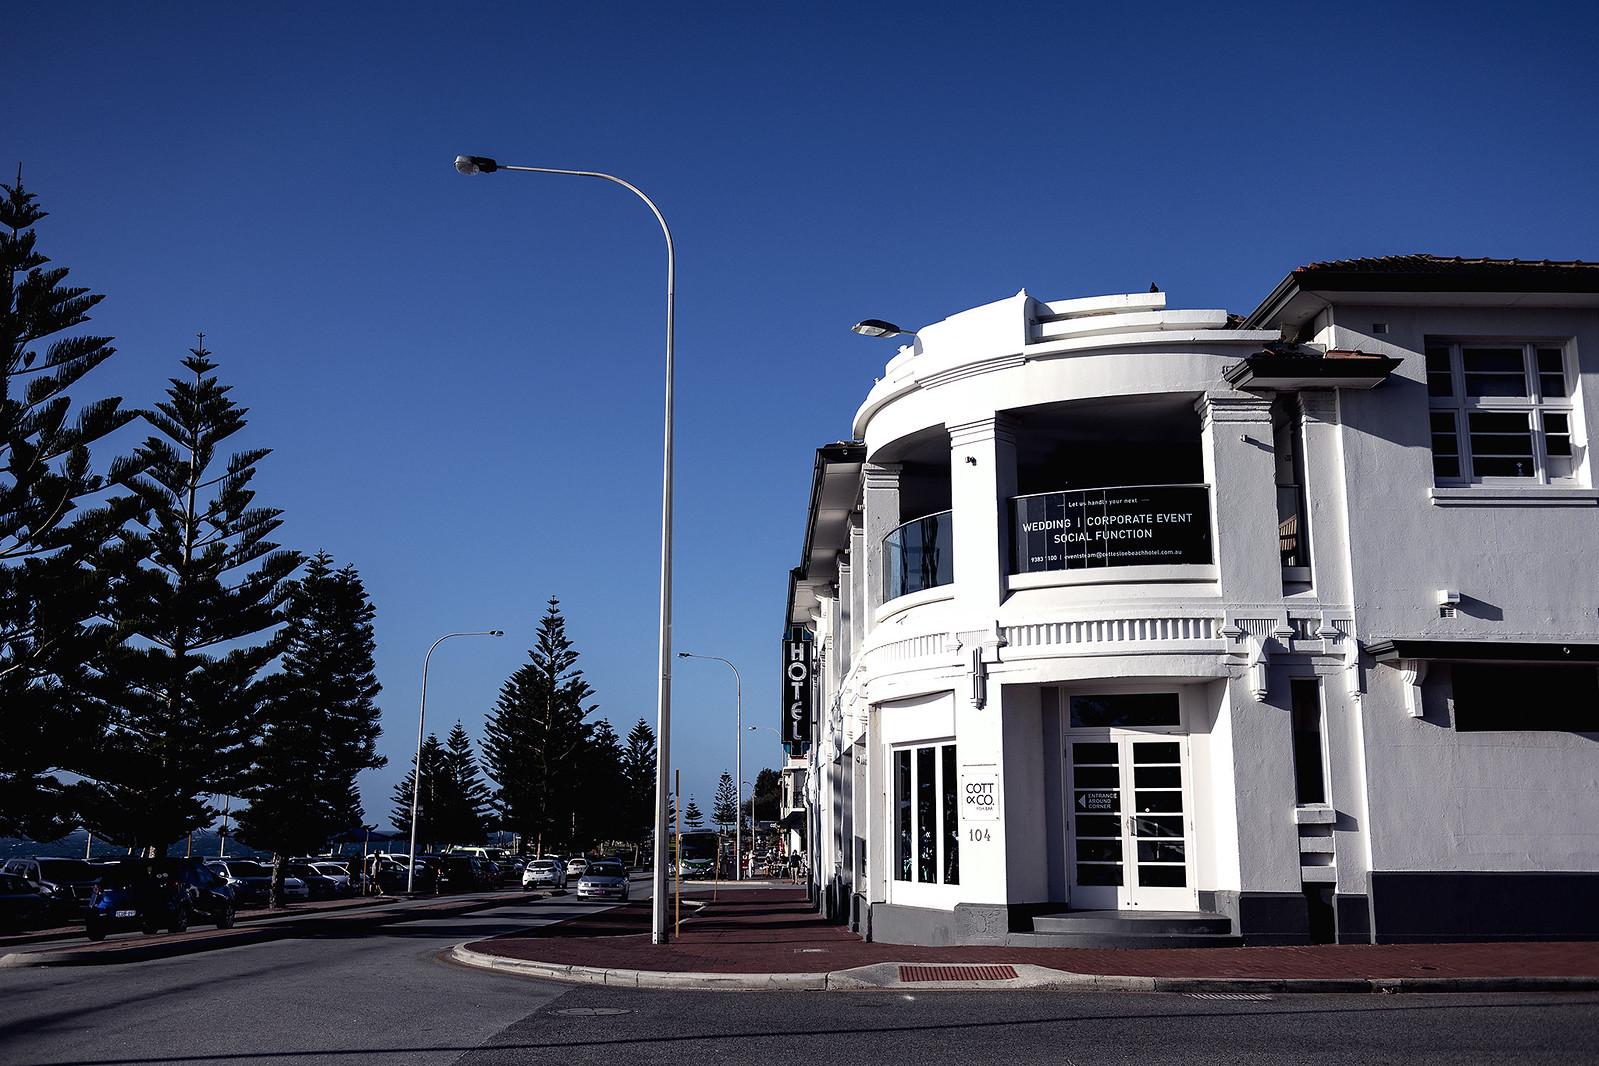 Cott Hotel